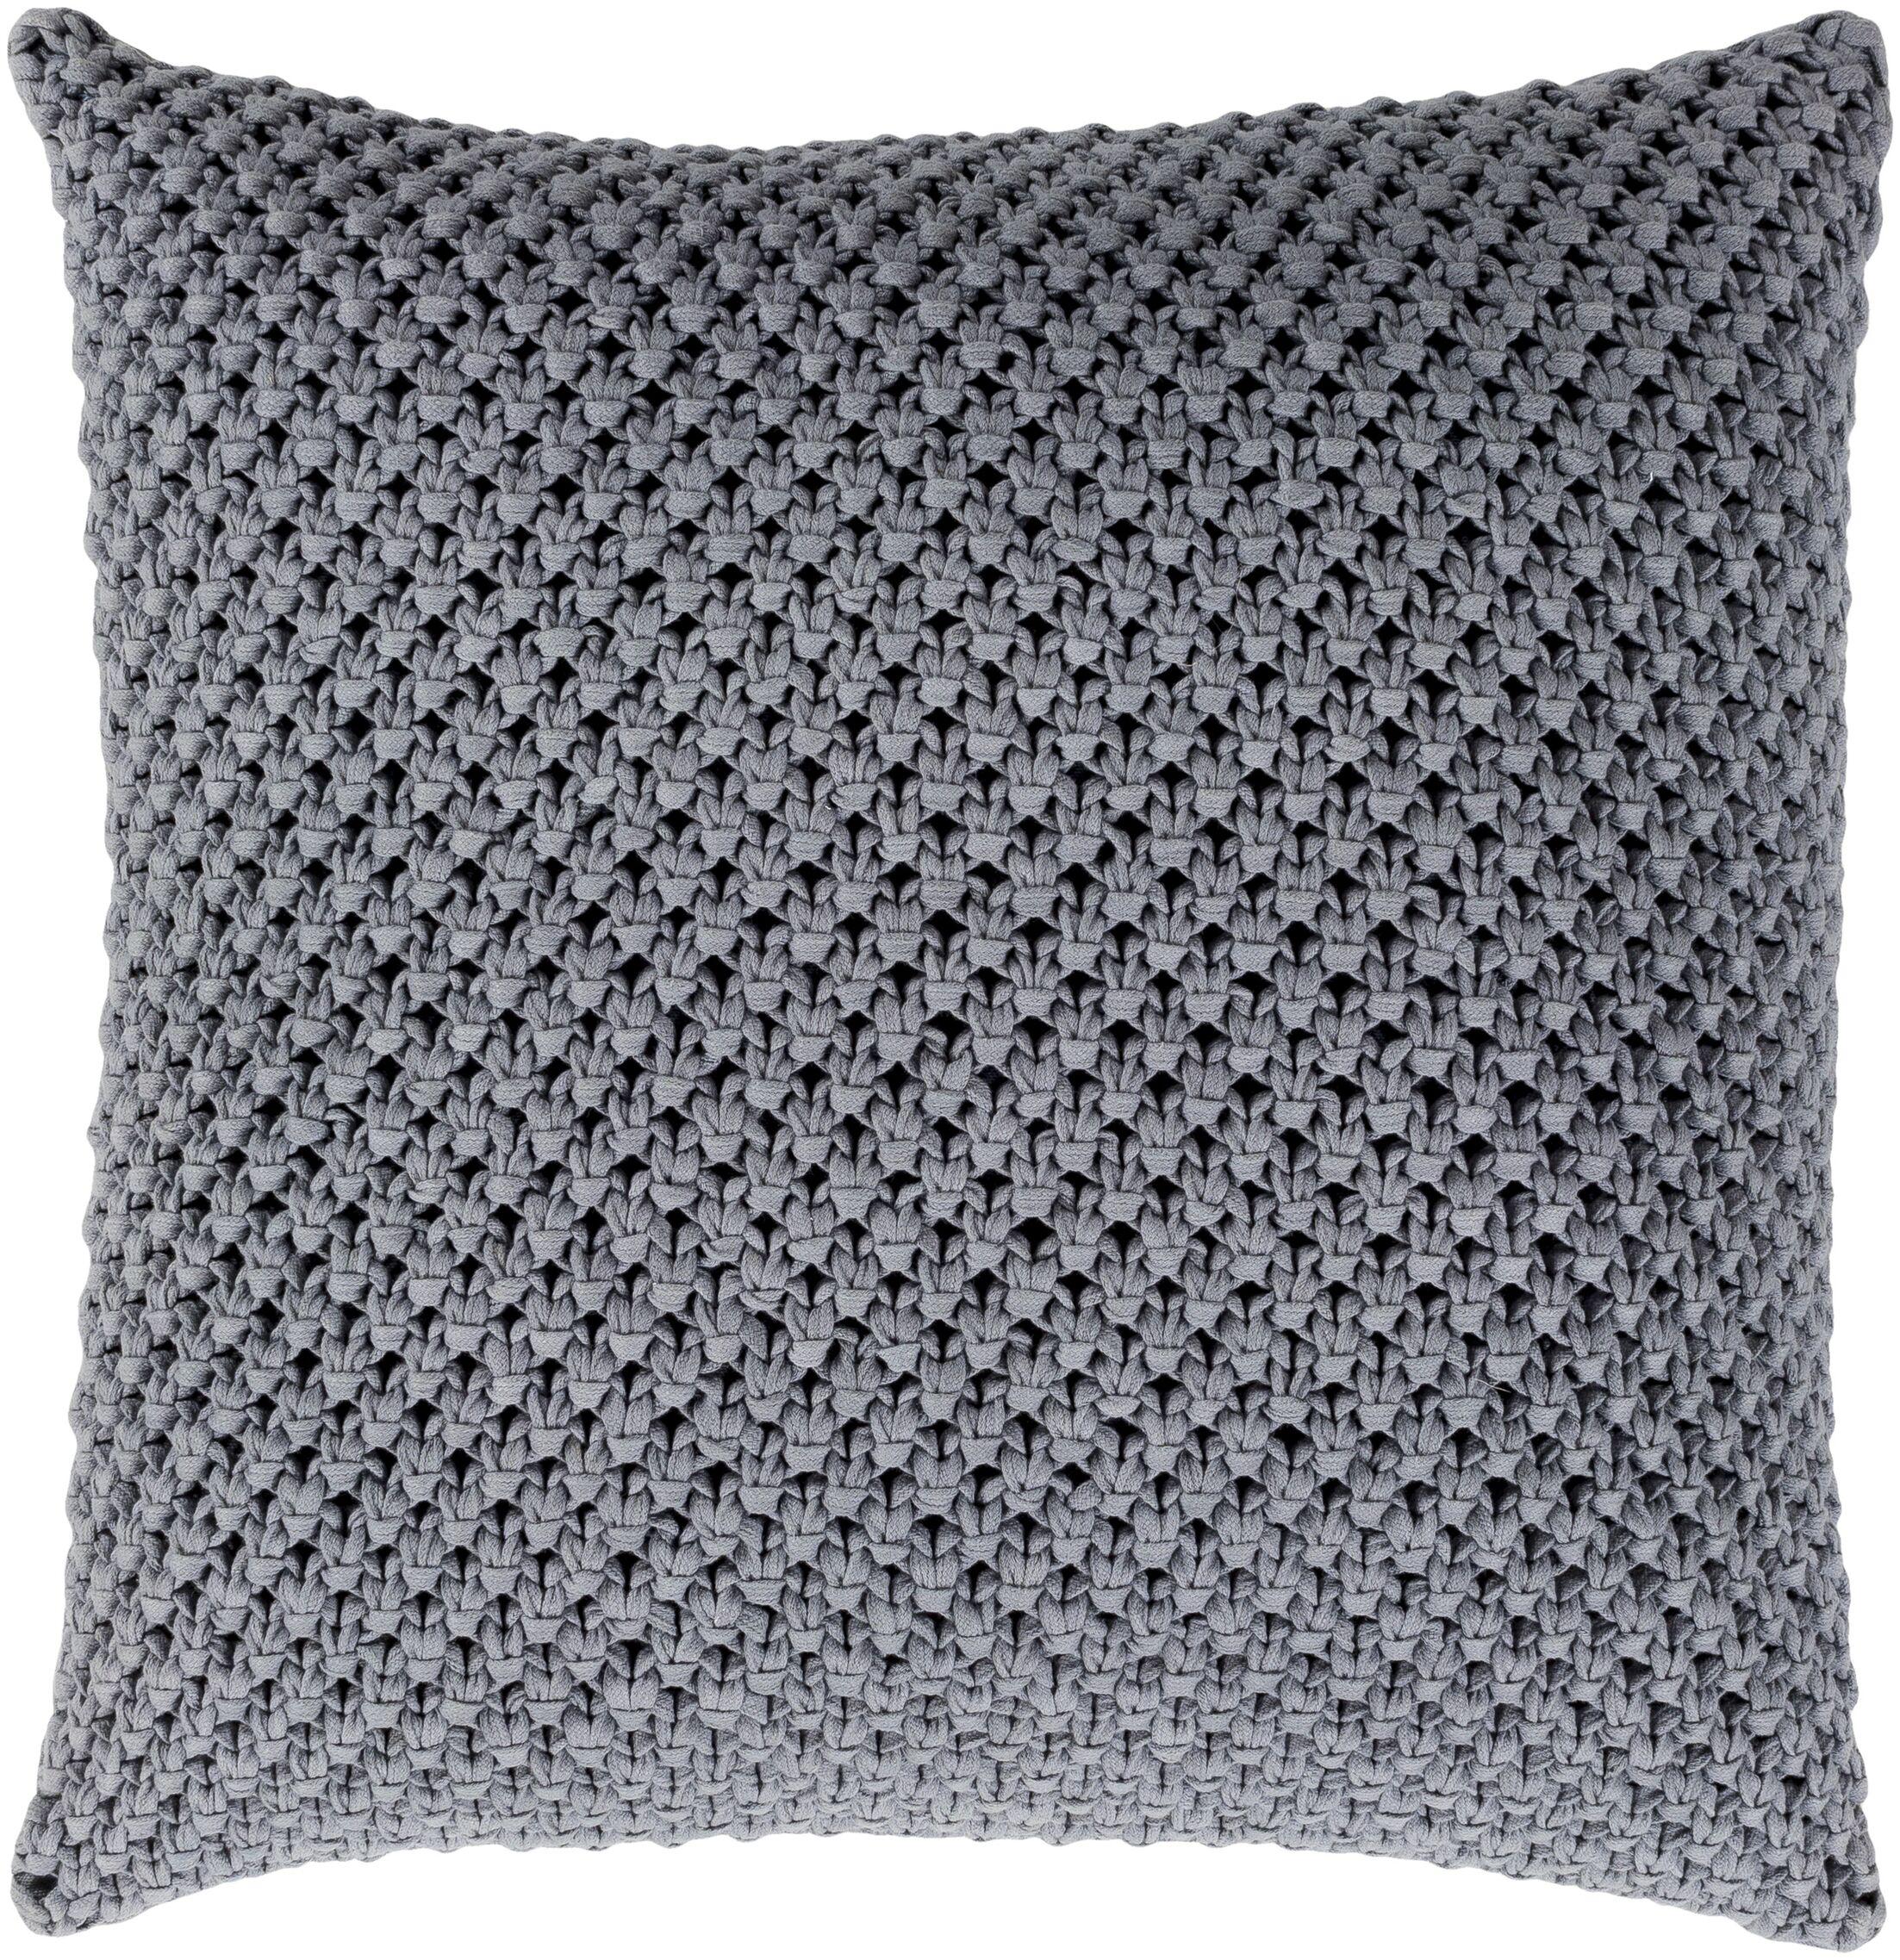 Godavari Natural Fiber Pillow Cover Fill Material: Poly Fill, Size: 22